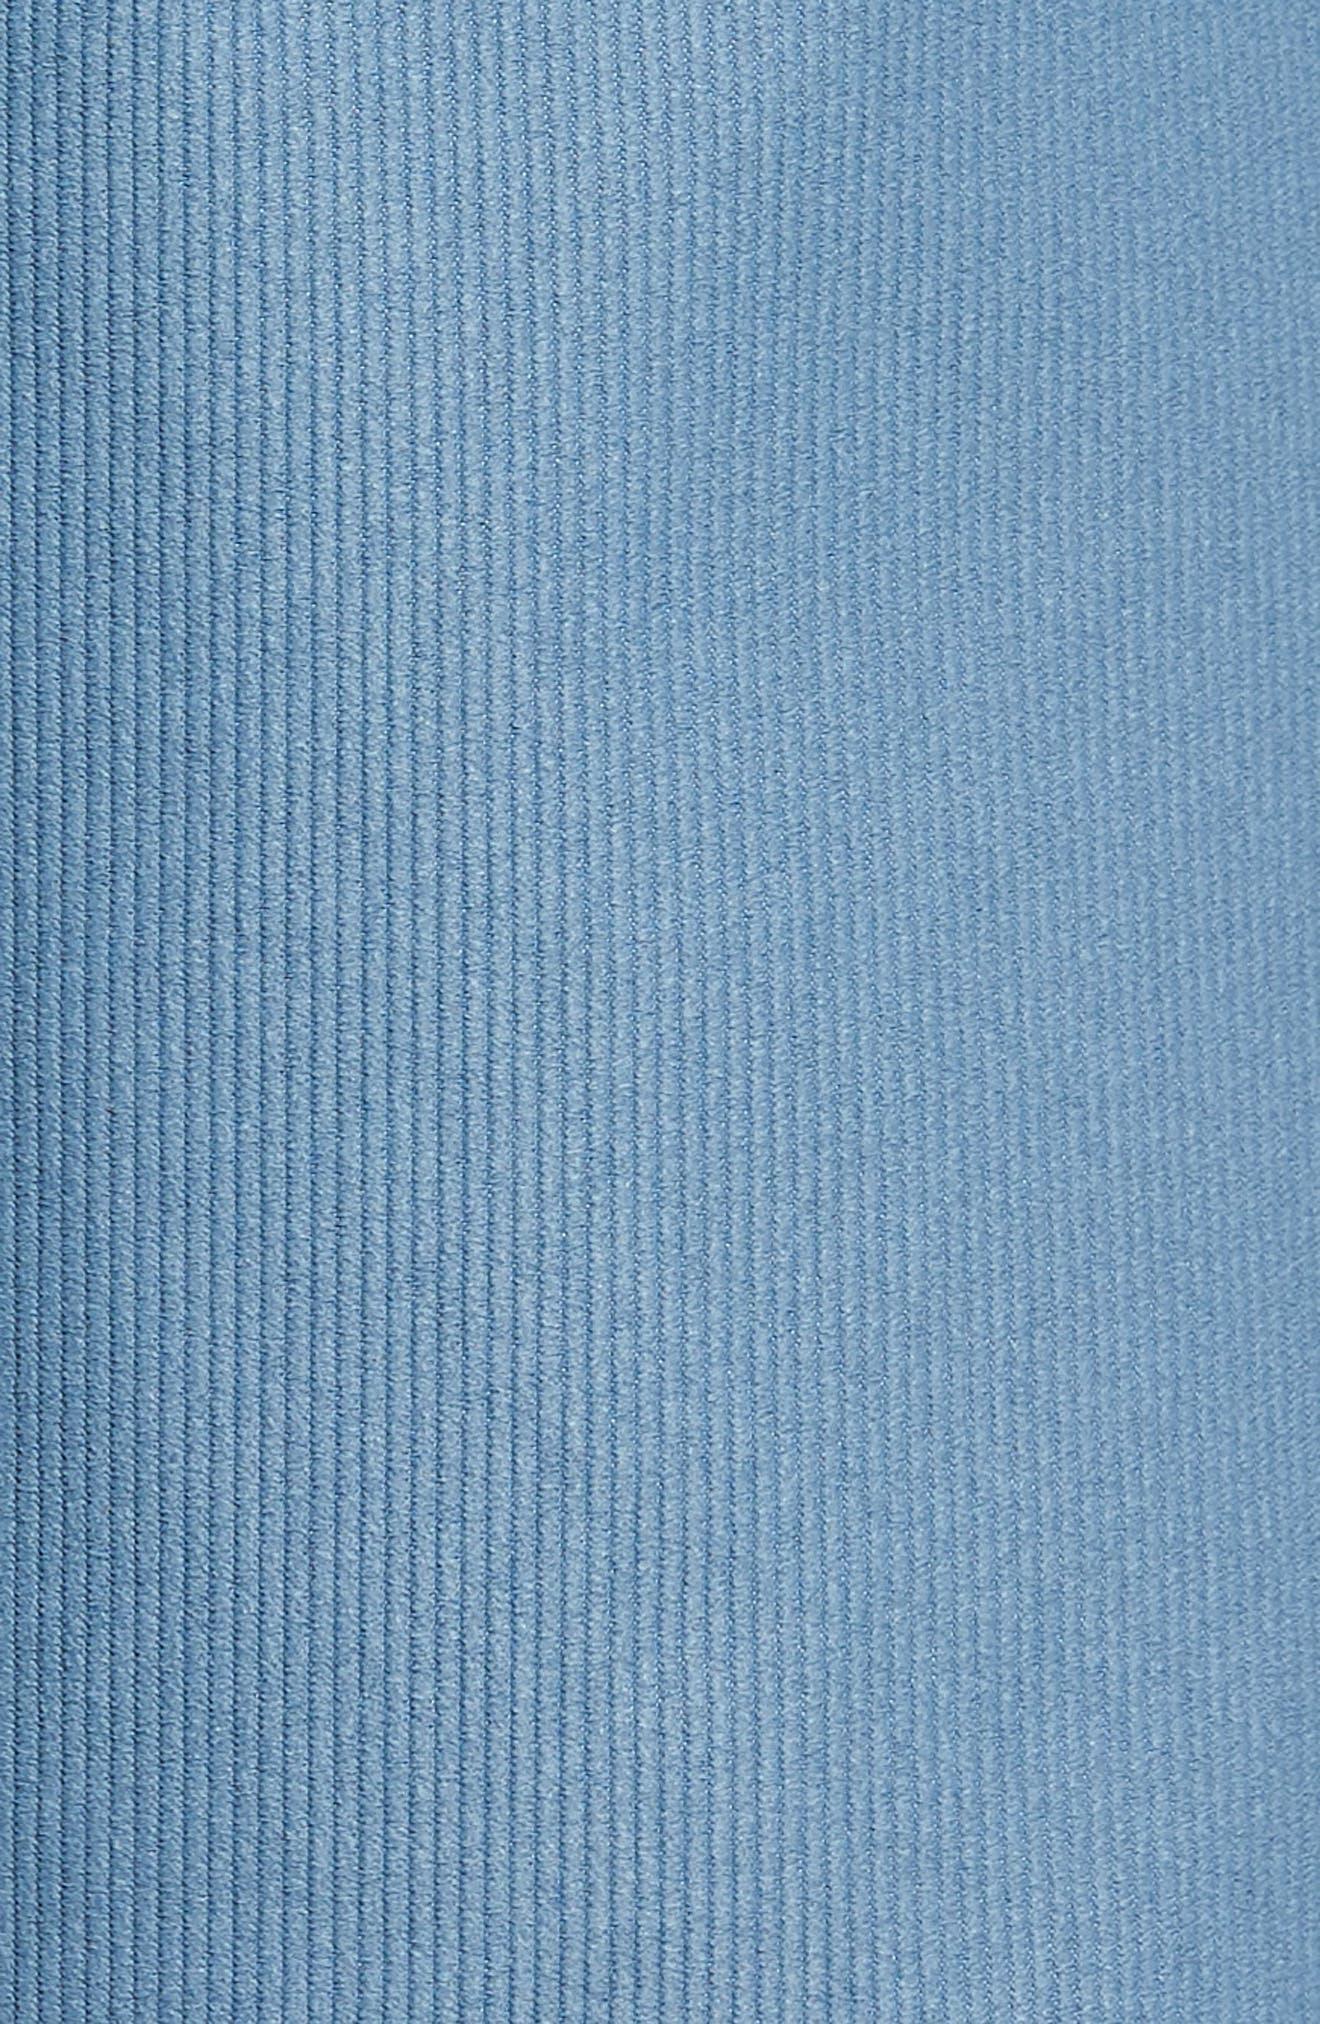 Outsider X Surf Corduroy Shorts,                             Alternate thumbnail 5, color,                             Powder Blue